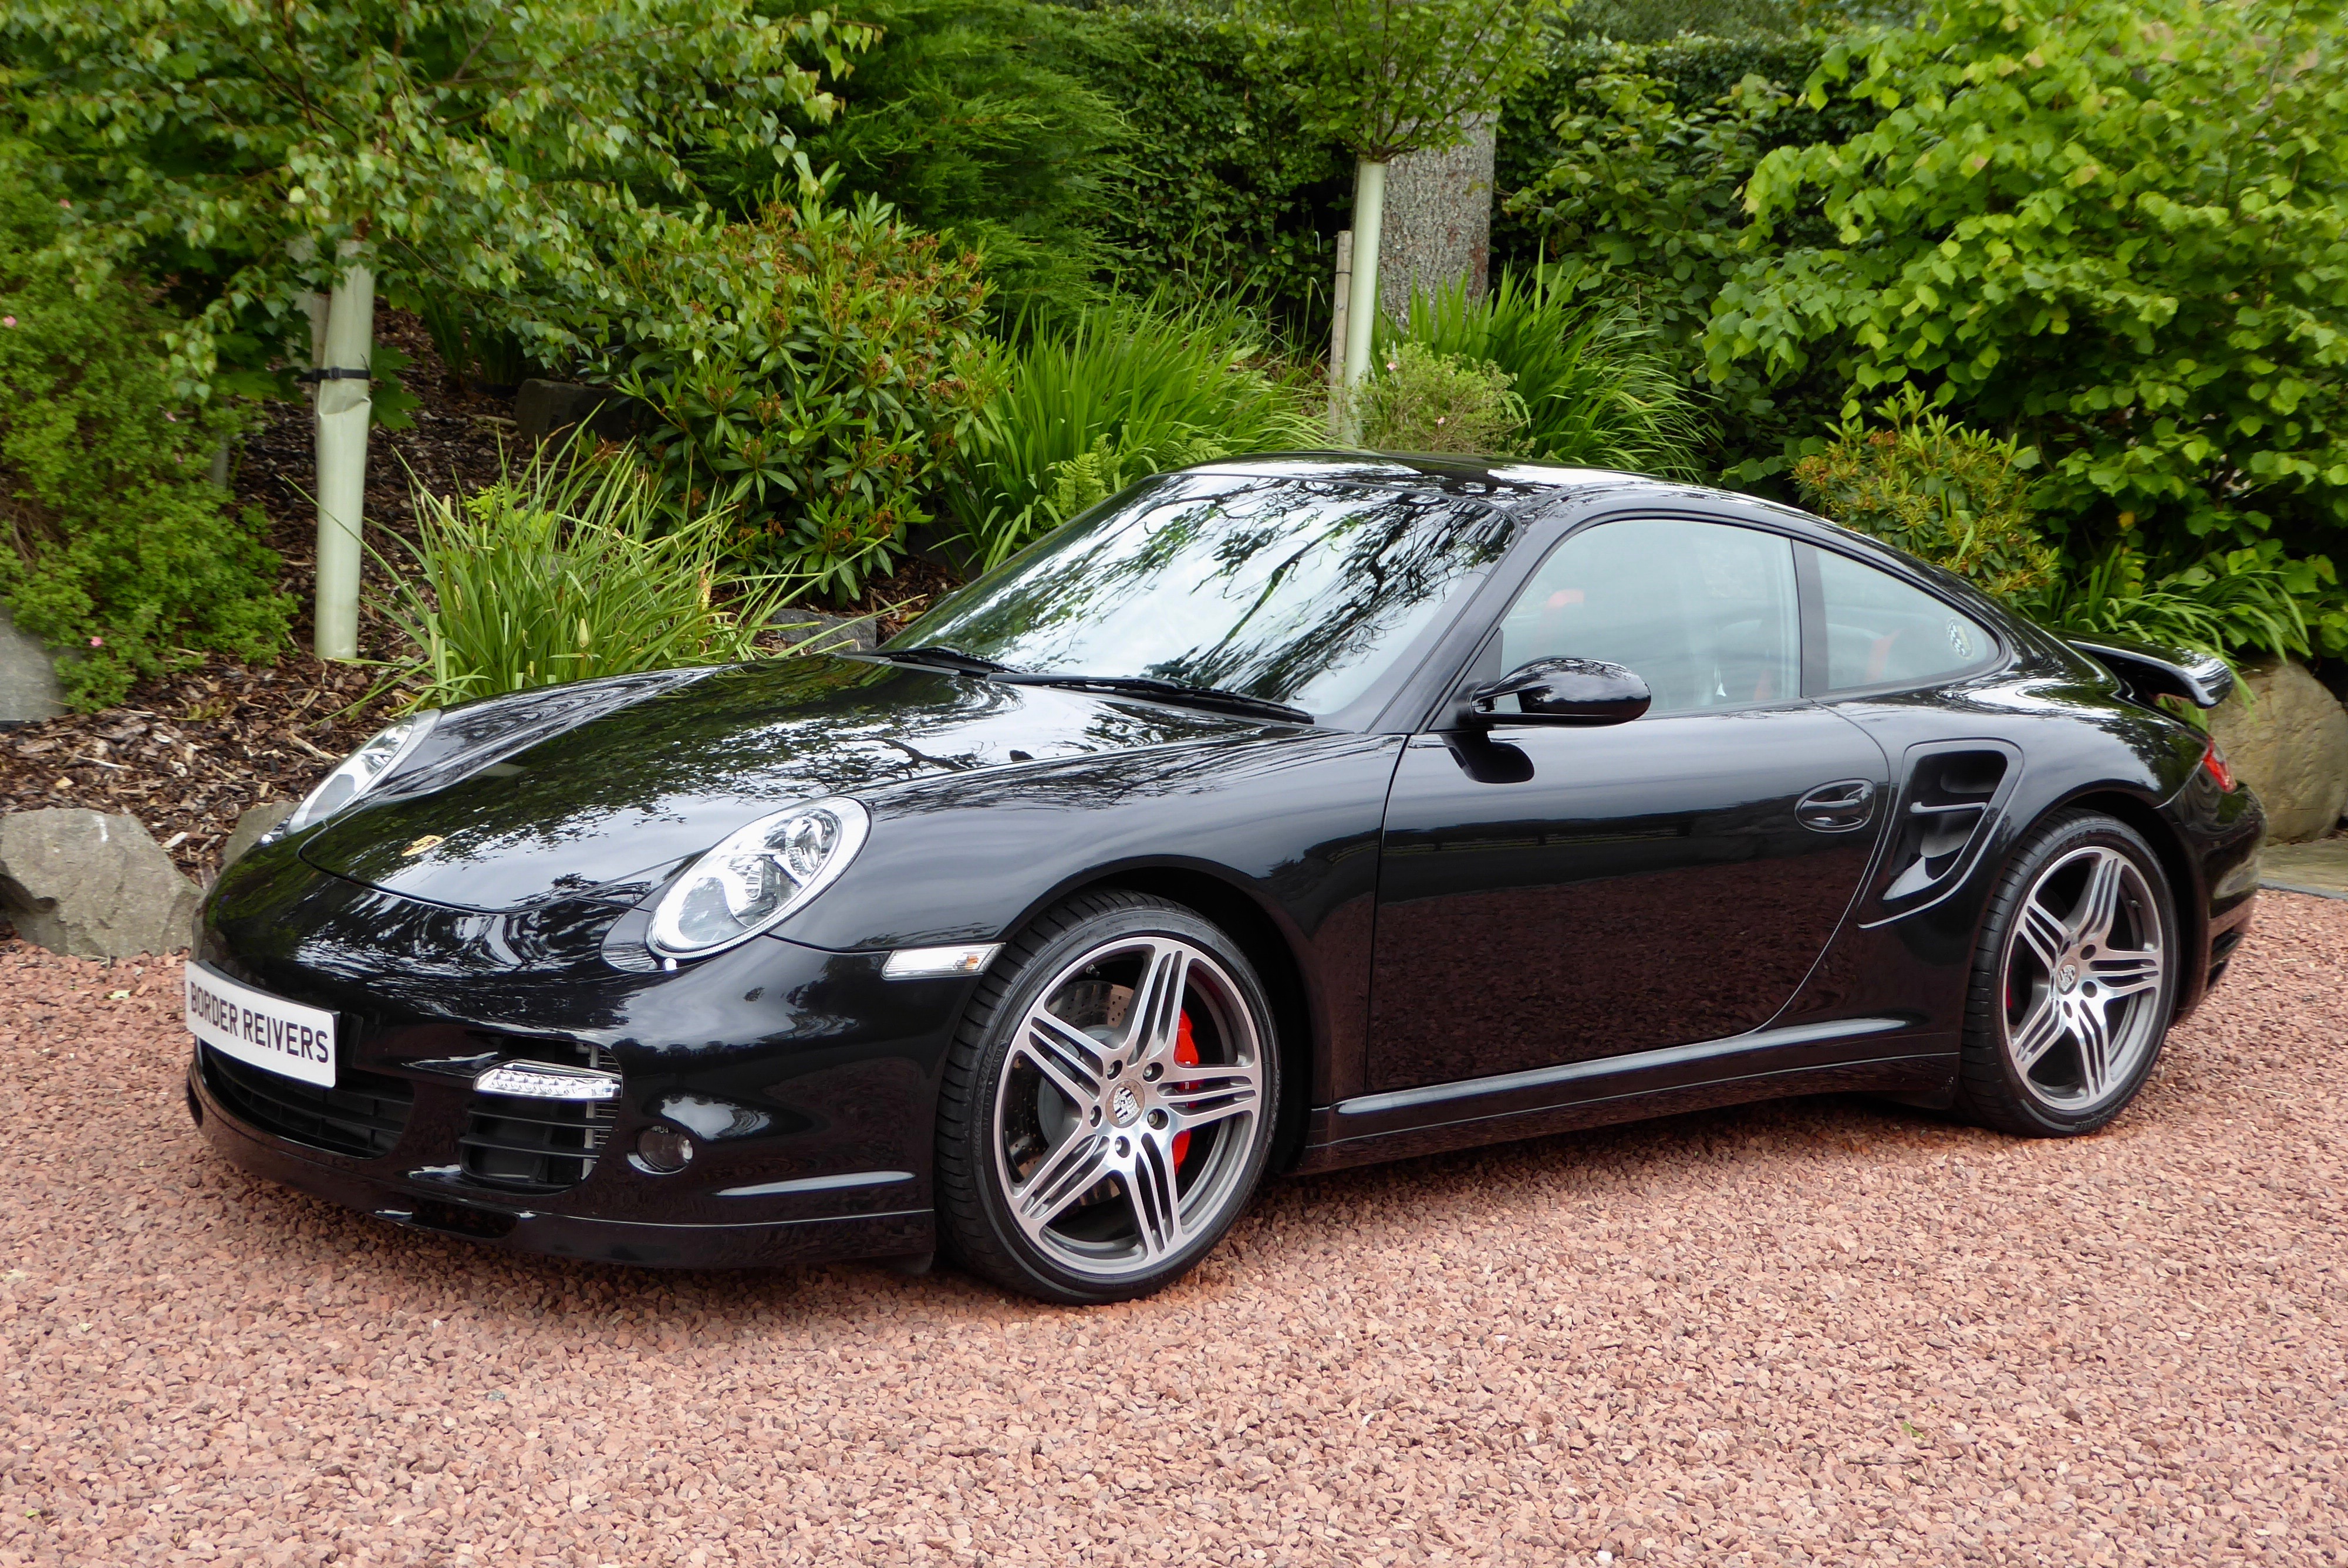 New Stock Due This Week Porsche 911 997 Turbo Manual Border Reivers